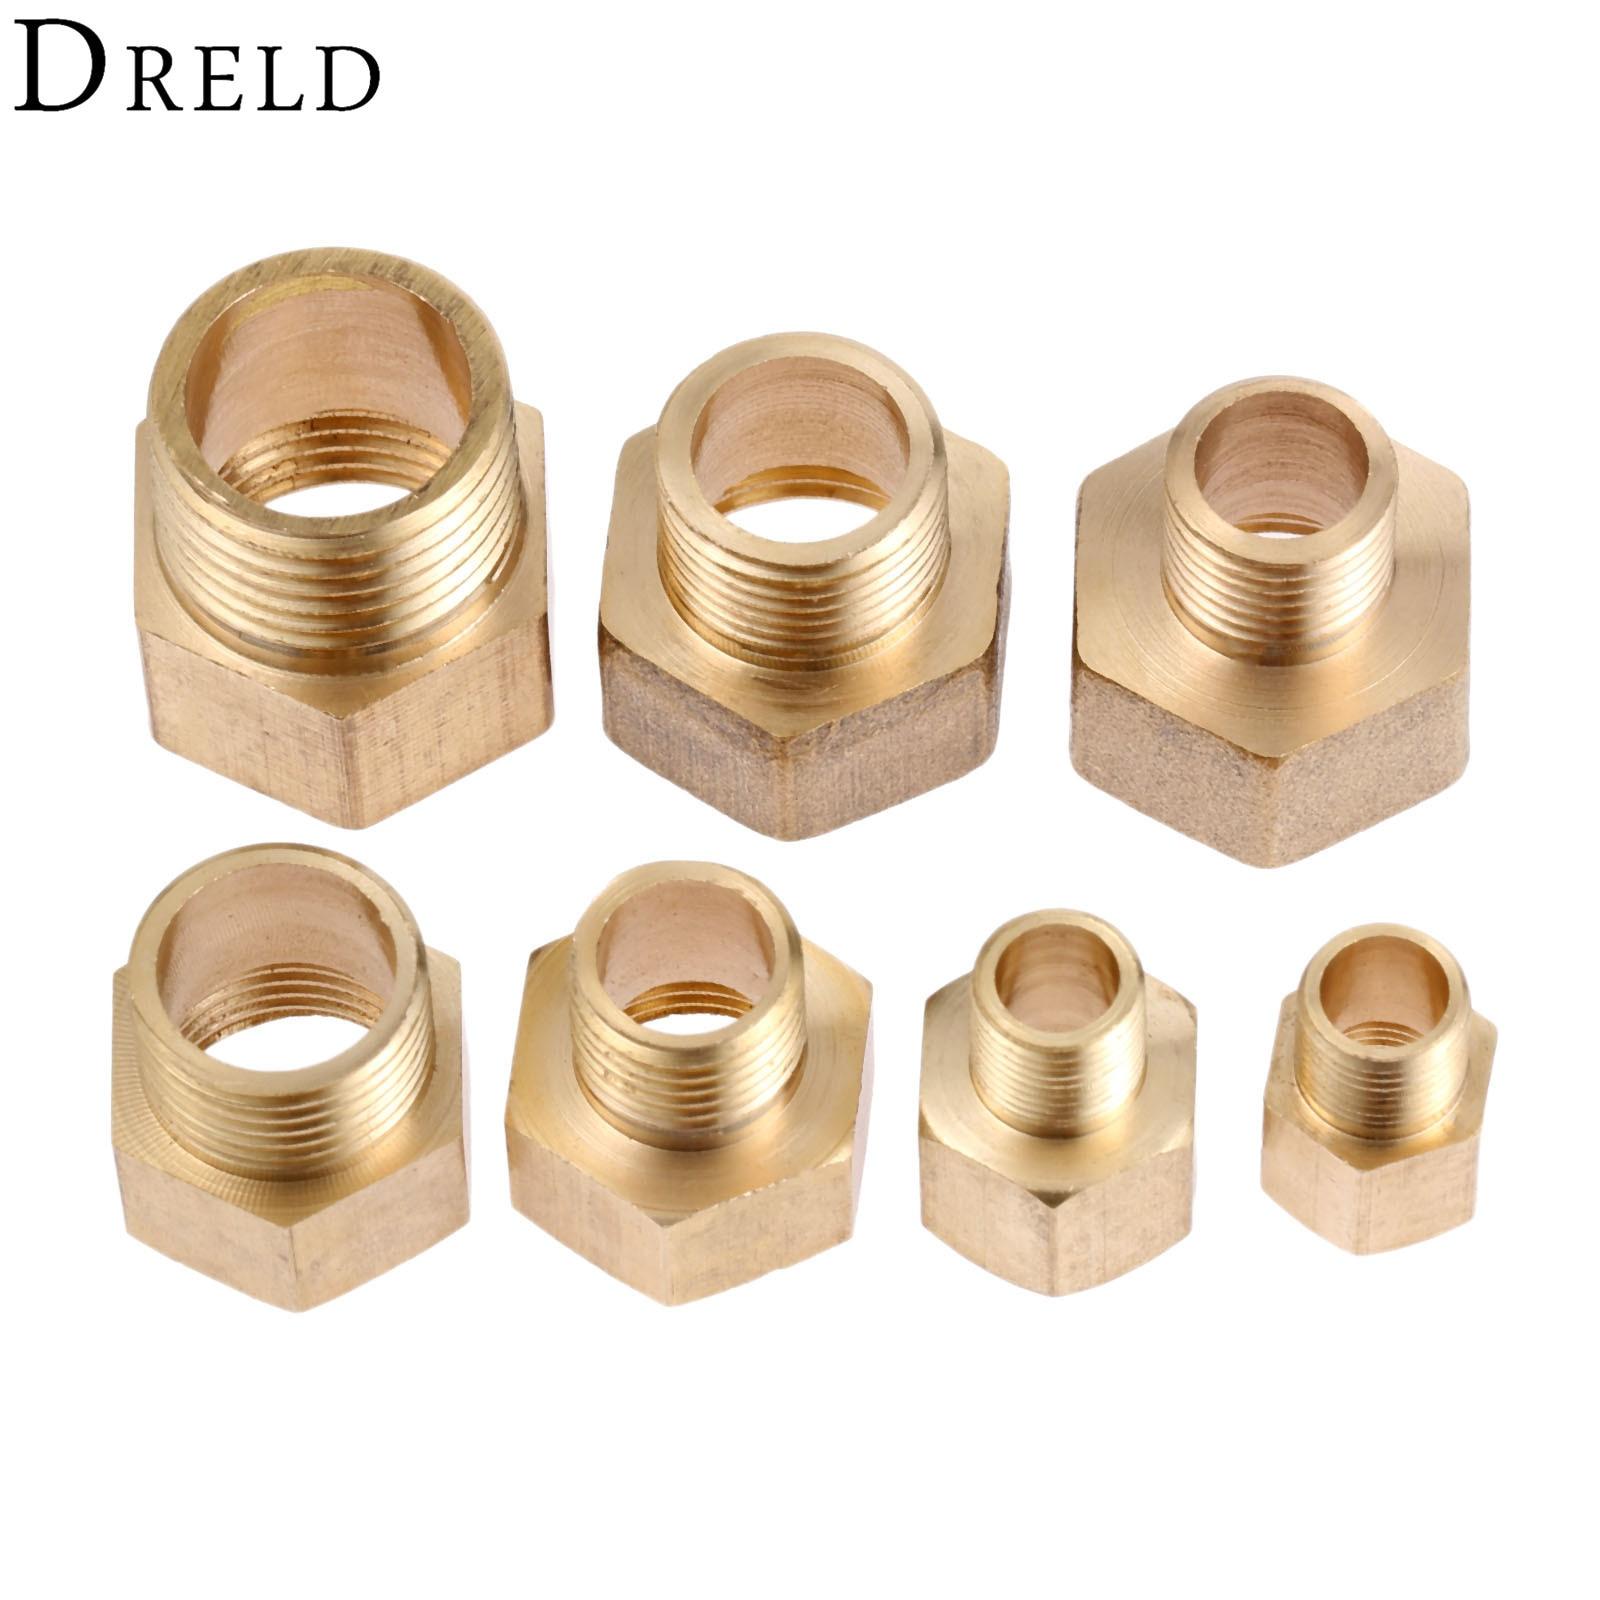 2Pcs Brass Hose Pipe Fittings F/M 1/8